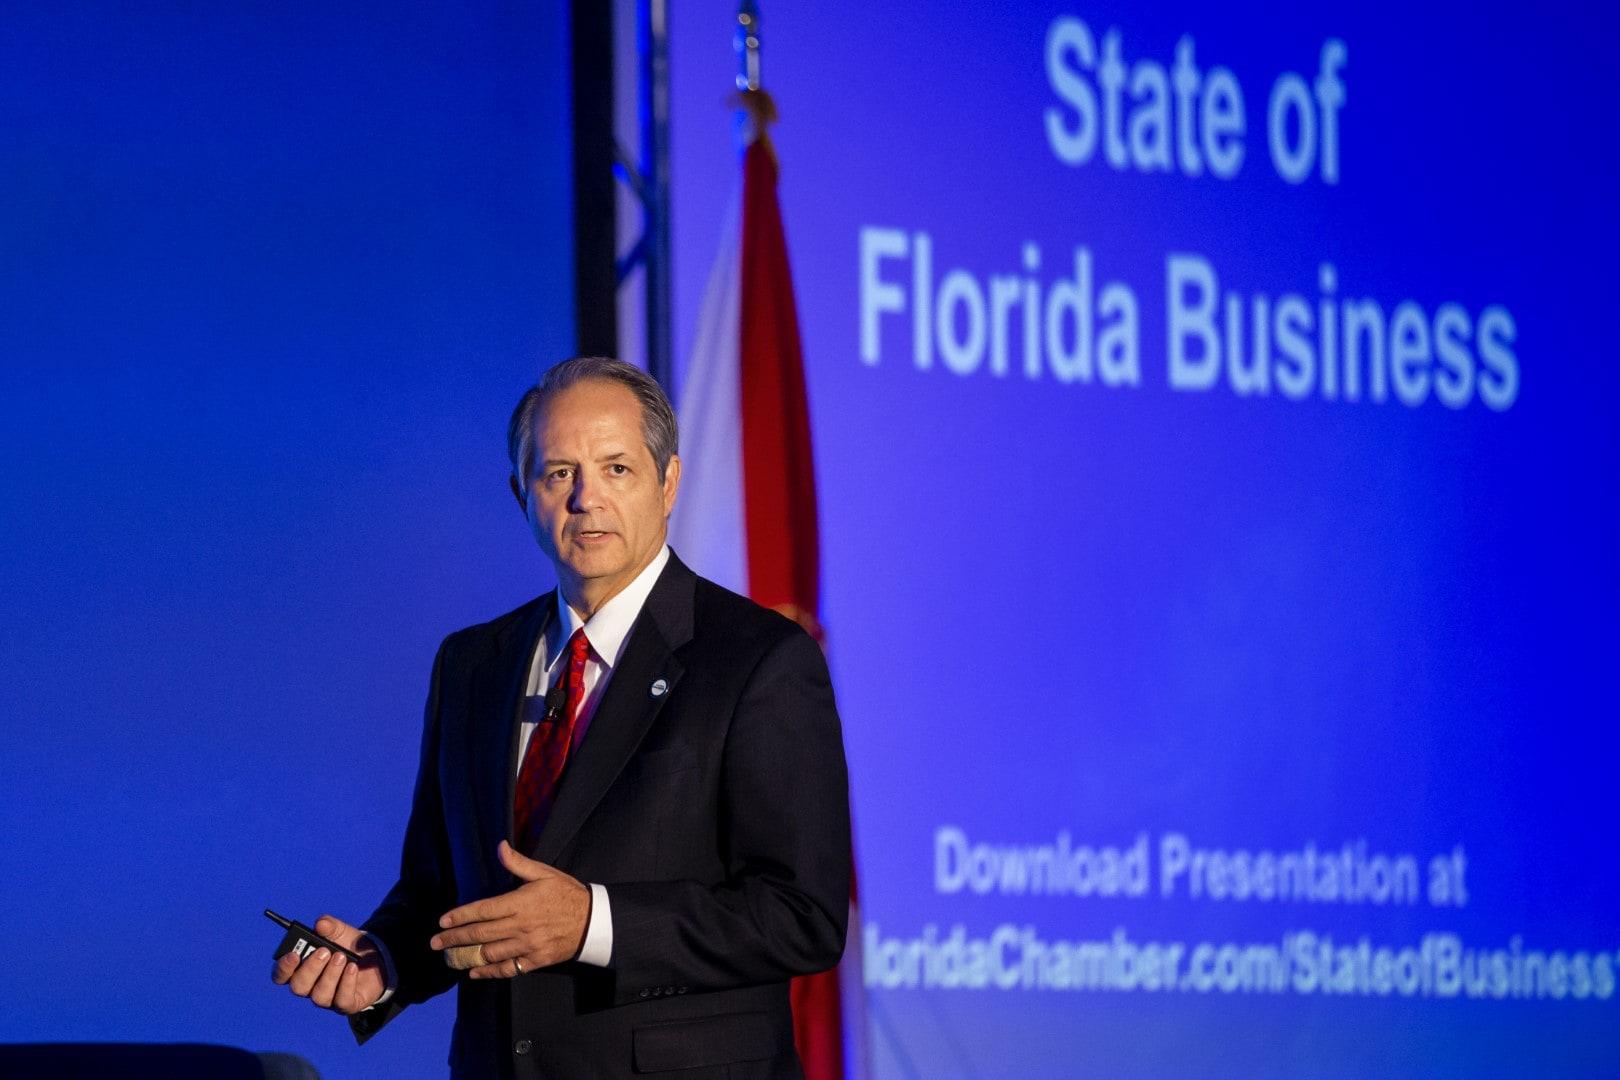 FUTURE-OF-FLORIDA-7-Large.jpg